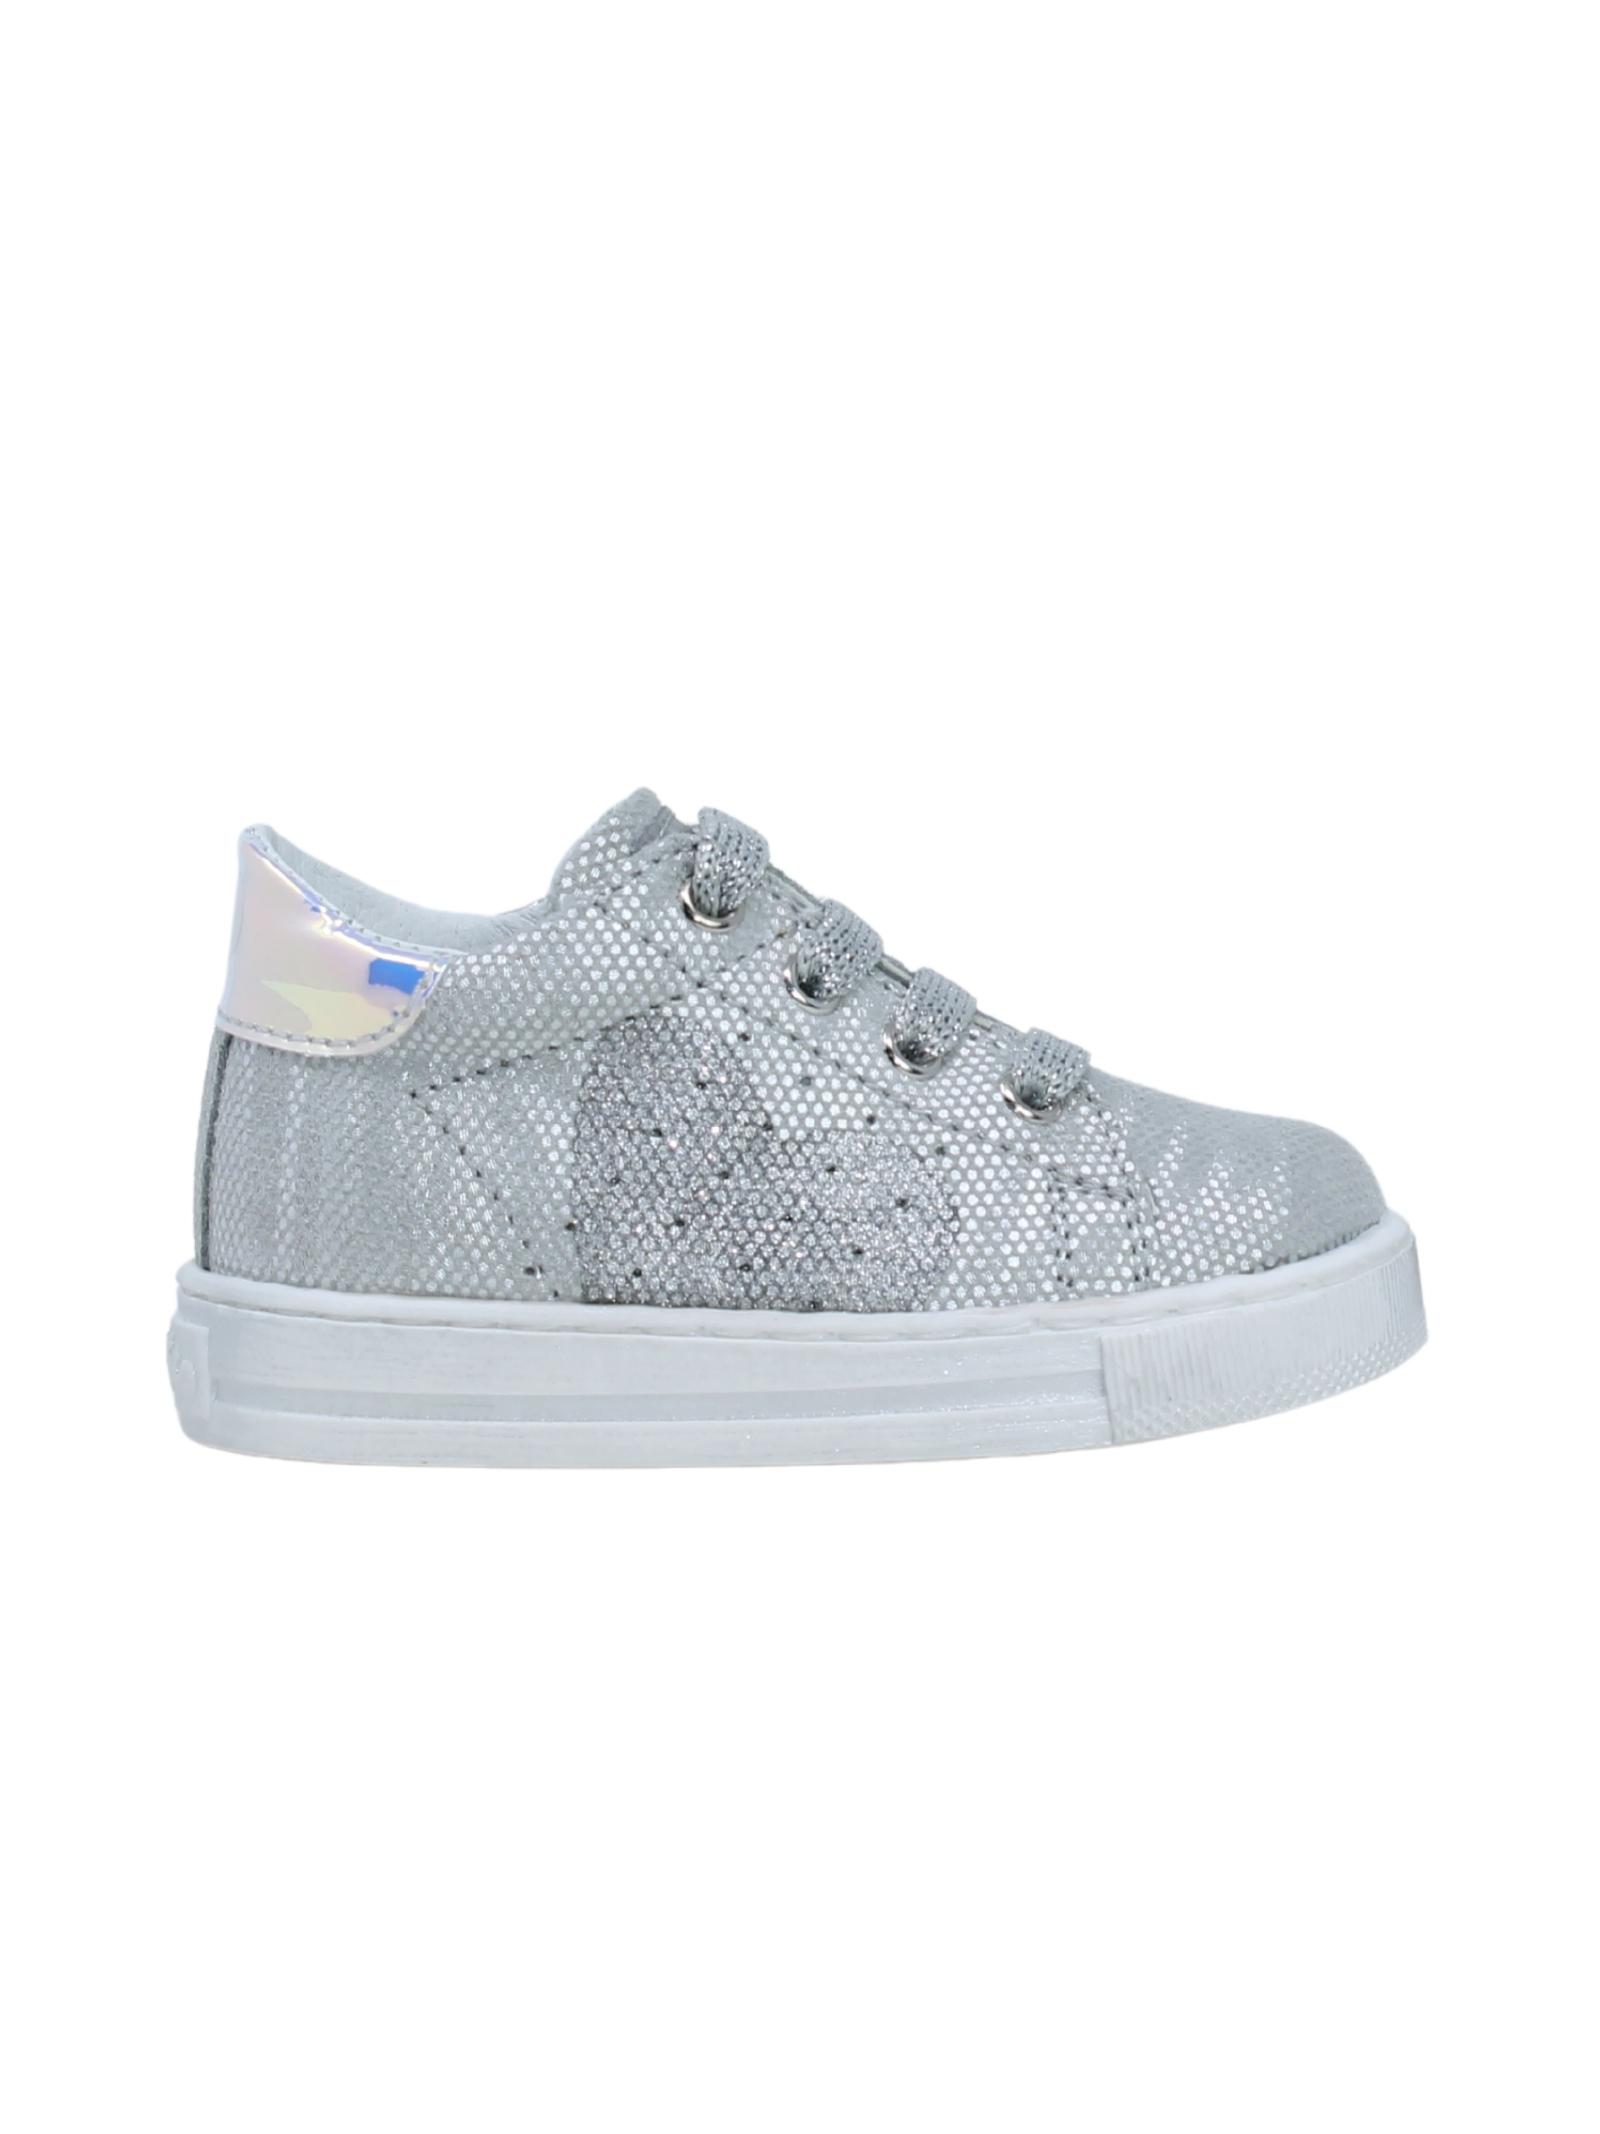 FALCOTTO | Sneakers | 20141150Q04